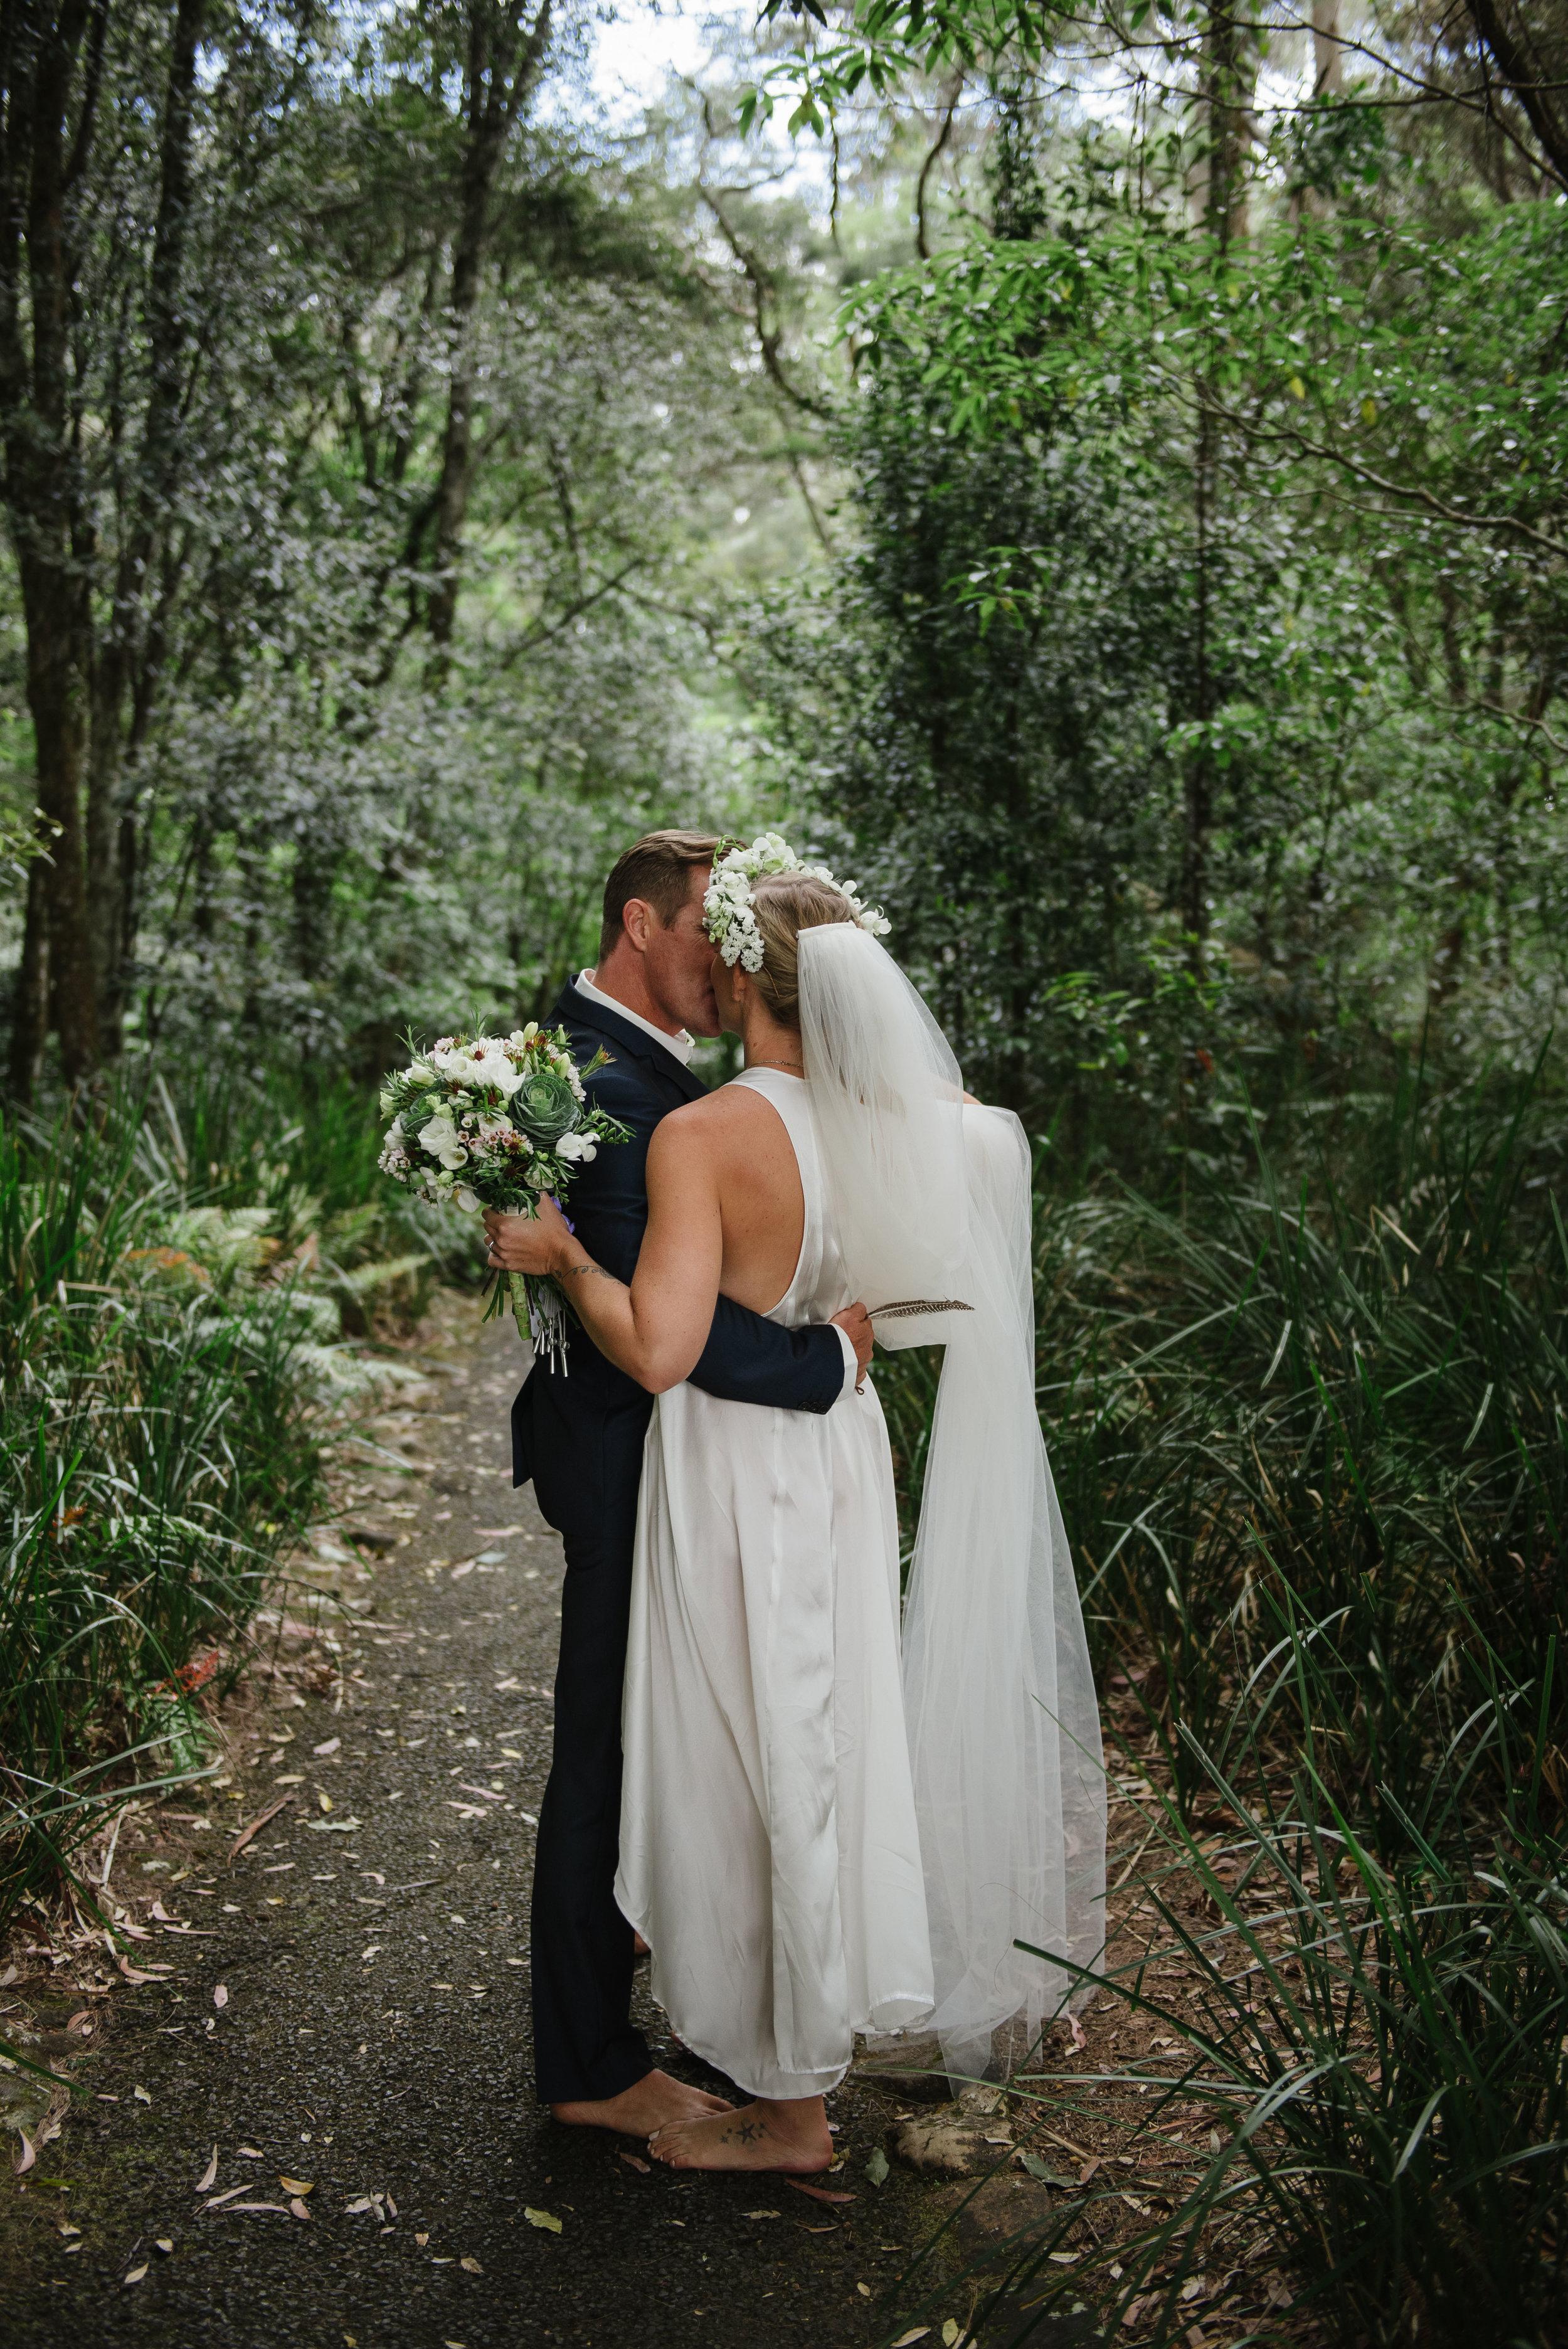 Carla and Luke- wedding photographer, byron bay wedding and family photographer, tweed heads wedding and family photography-325.jpg